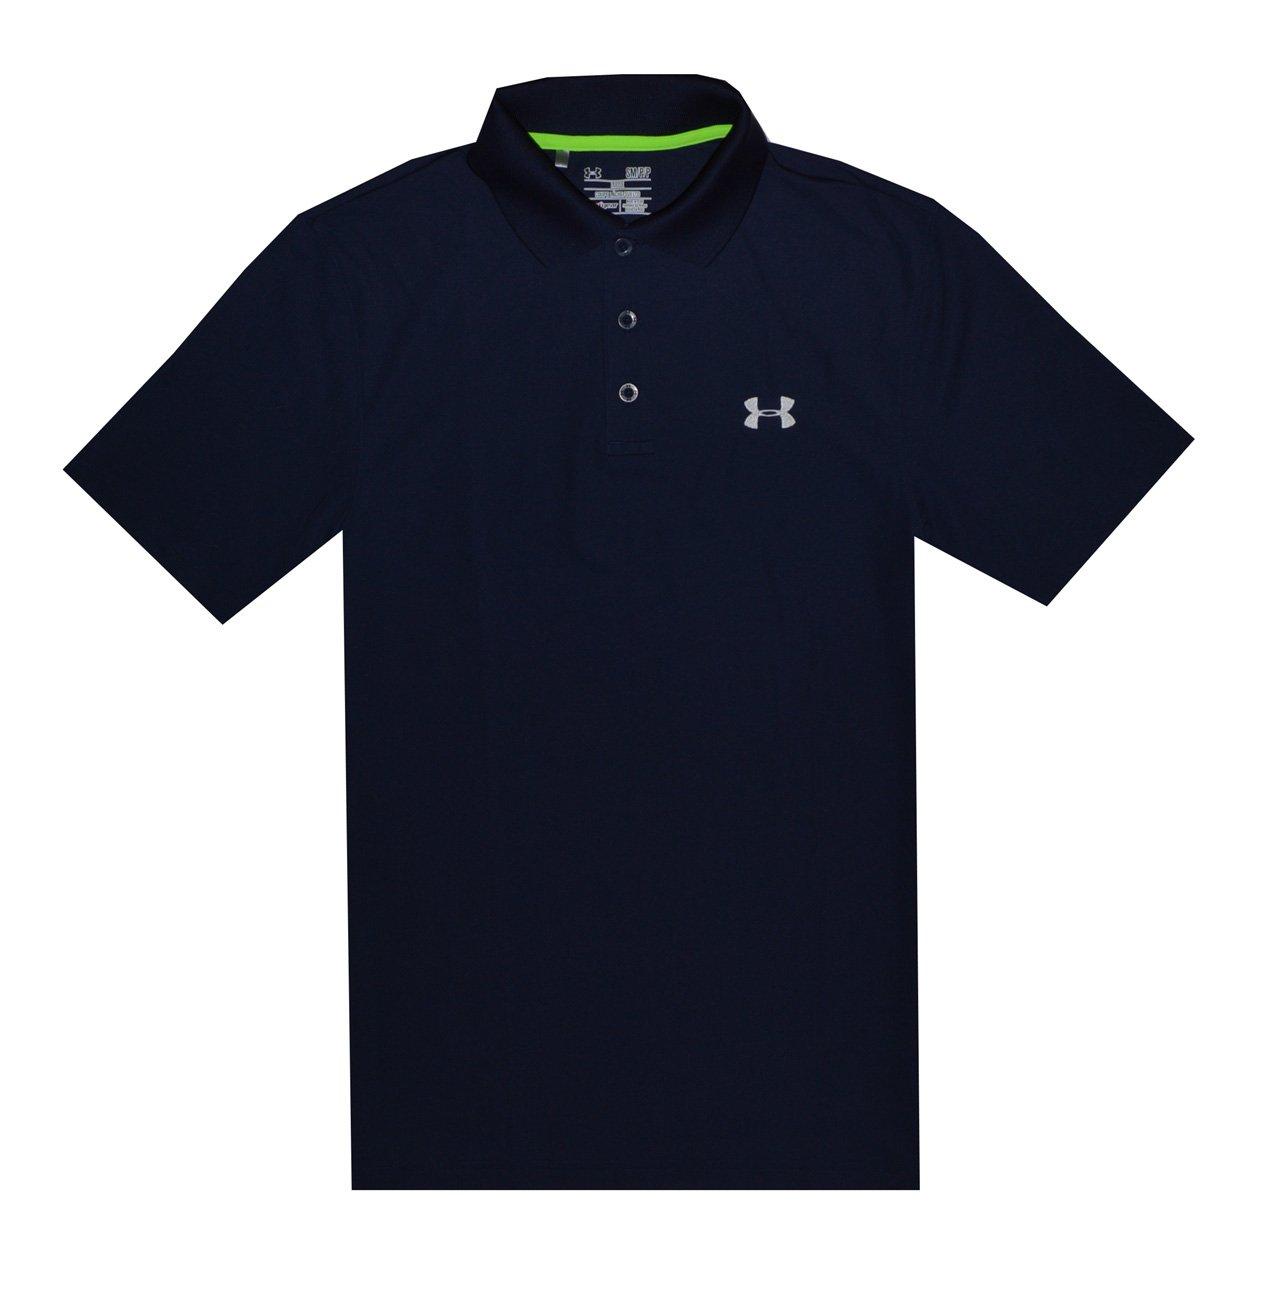 2f2f6ac6 Amazon.com: Under Armour Men UA Golf Performance Logo Polo T-Shirt: Clothing